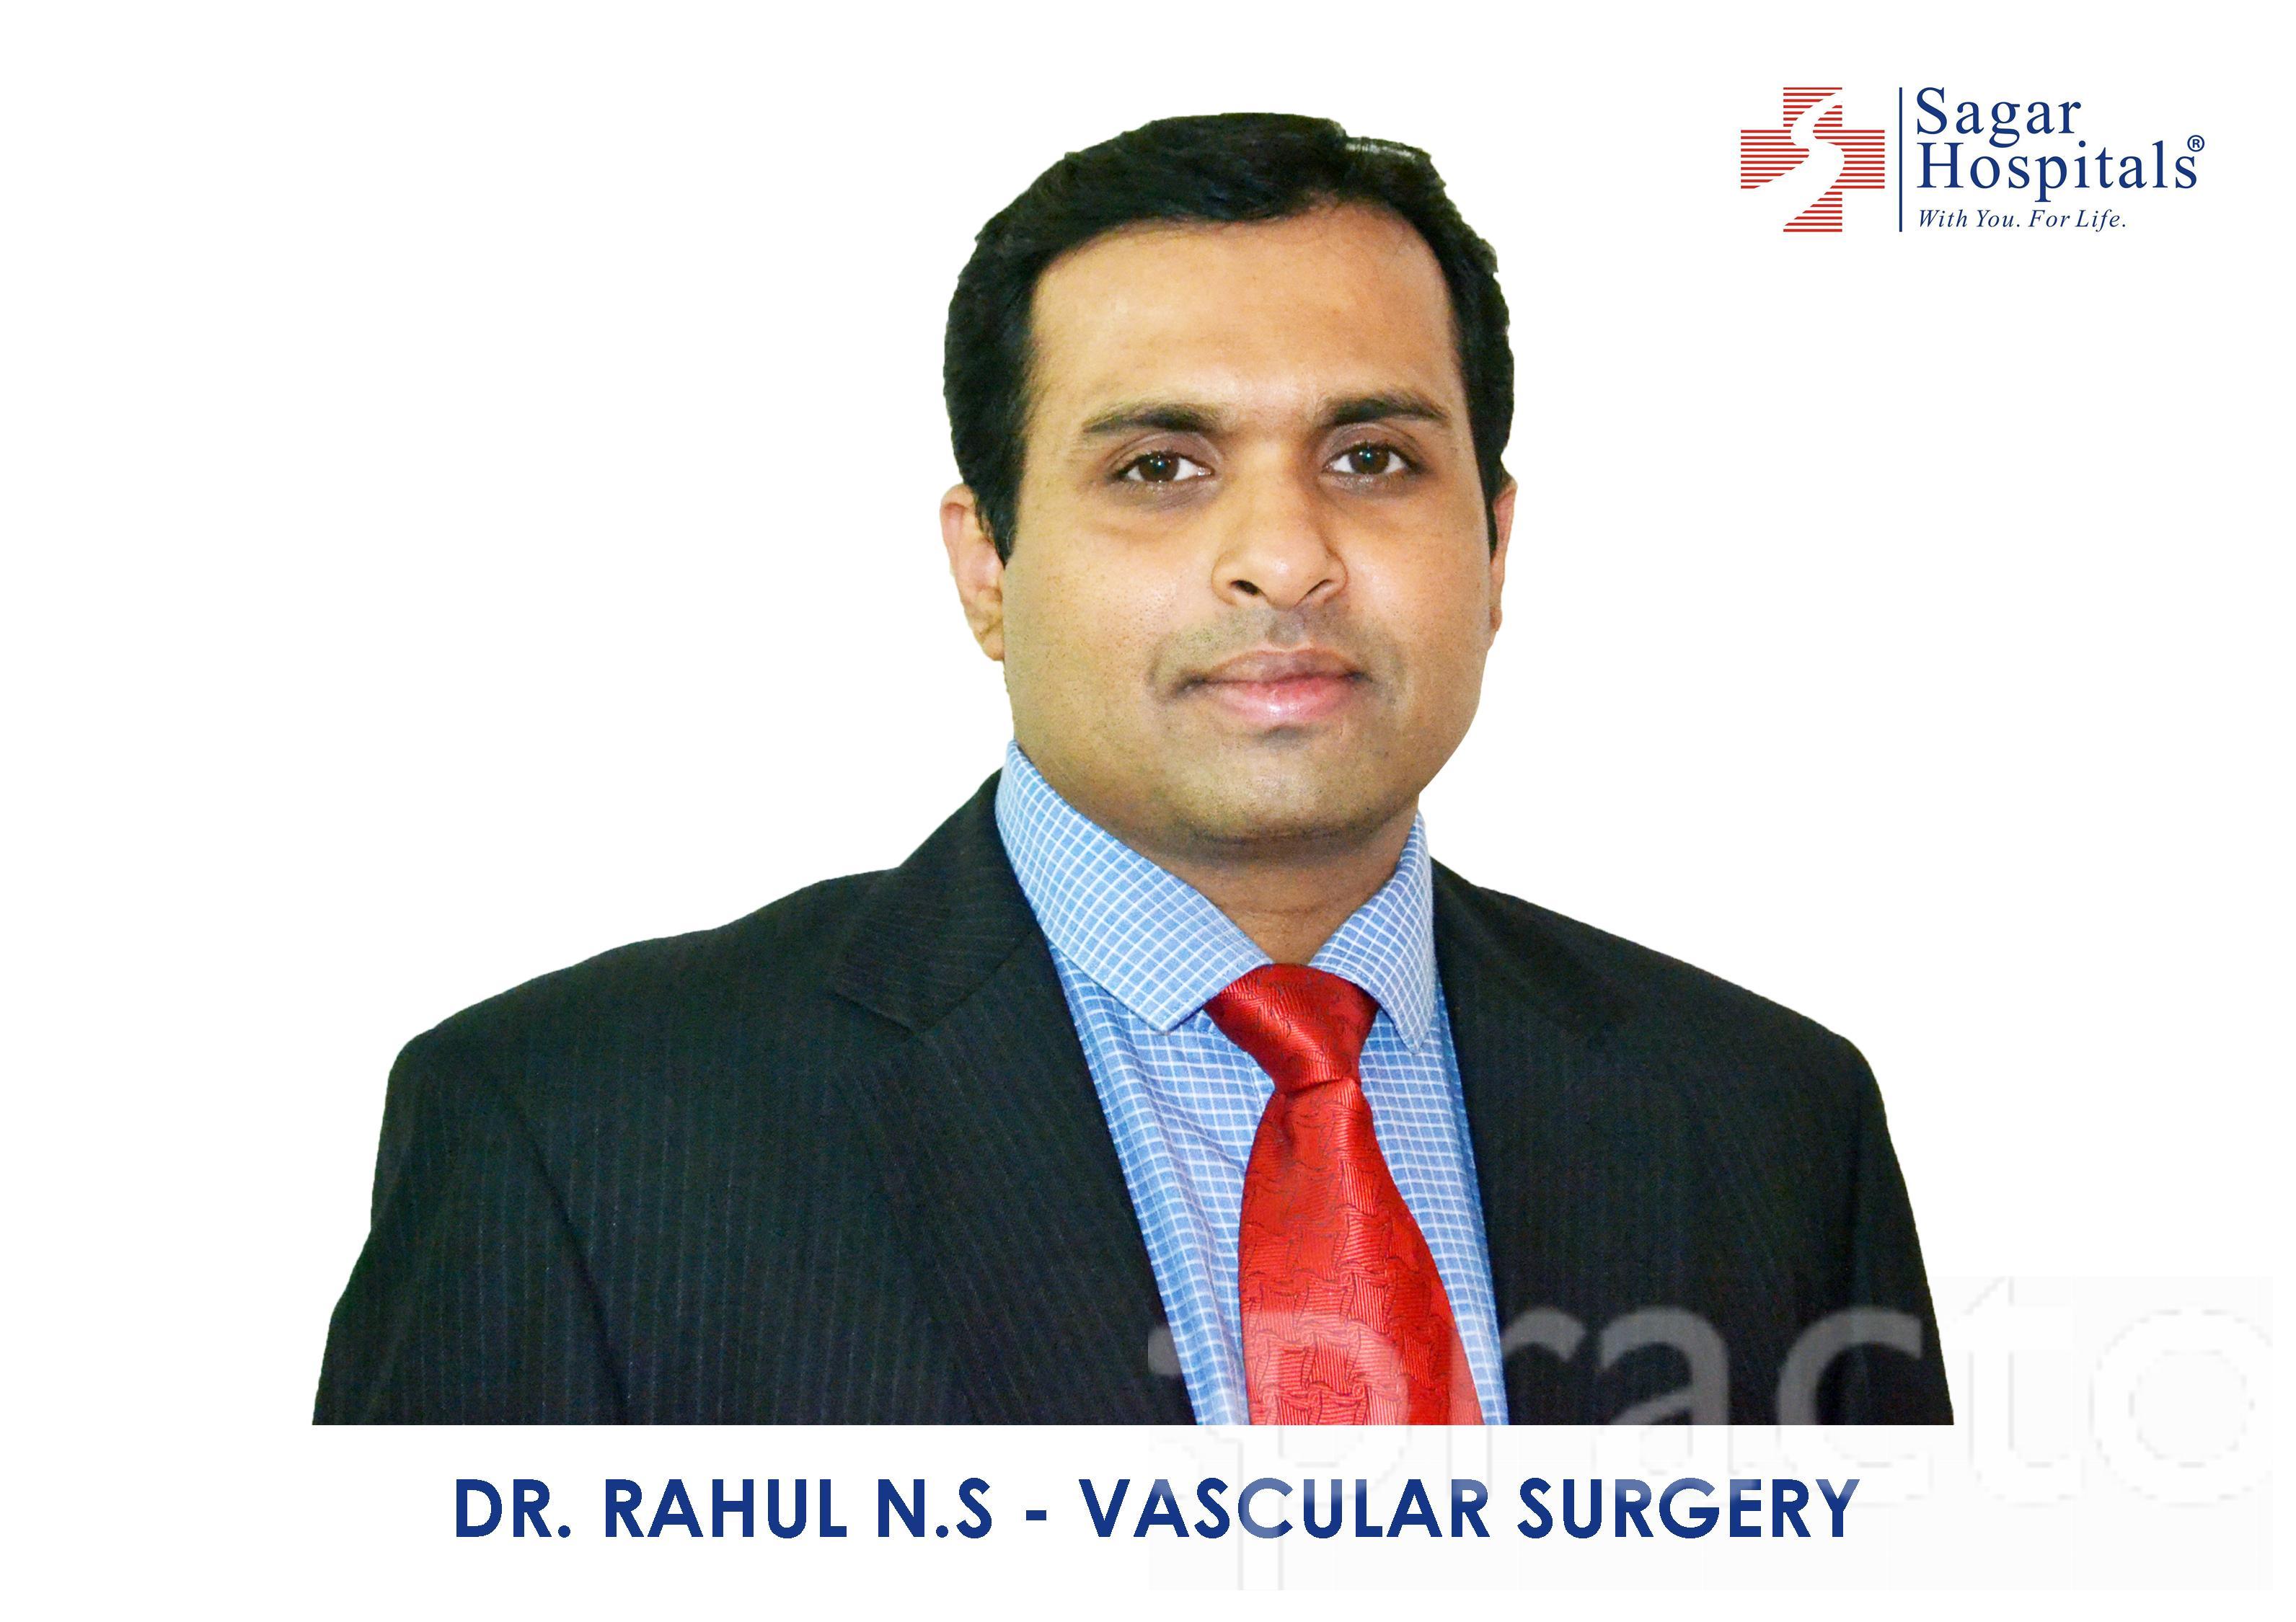 Dr. Rahul.N.S - Vascular Surgeon